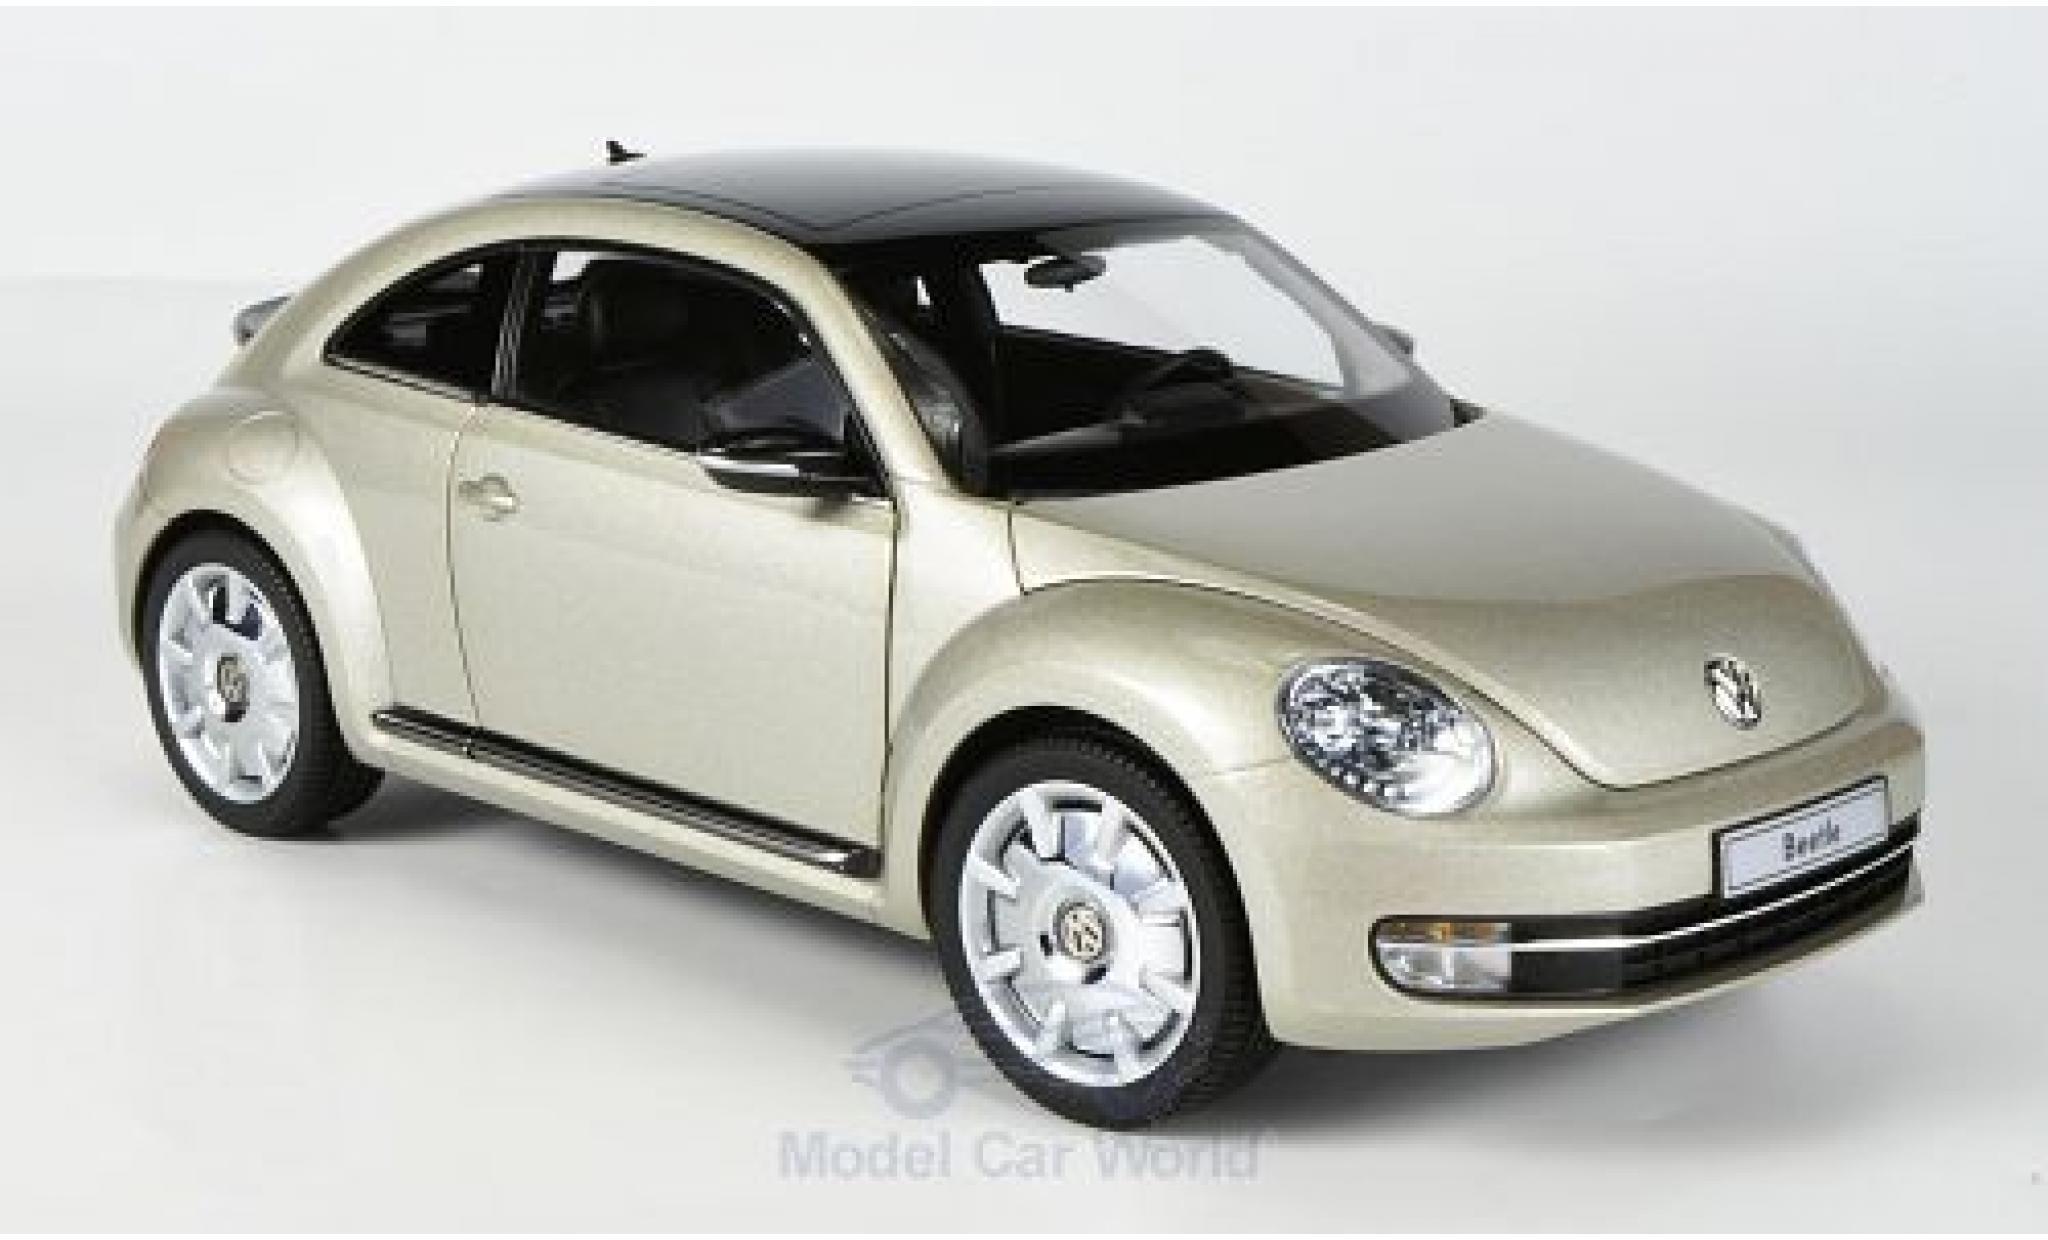 Volkswagen Beetle 1/18 Kyosho Coupe metallic-beige 2011